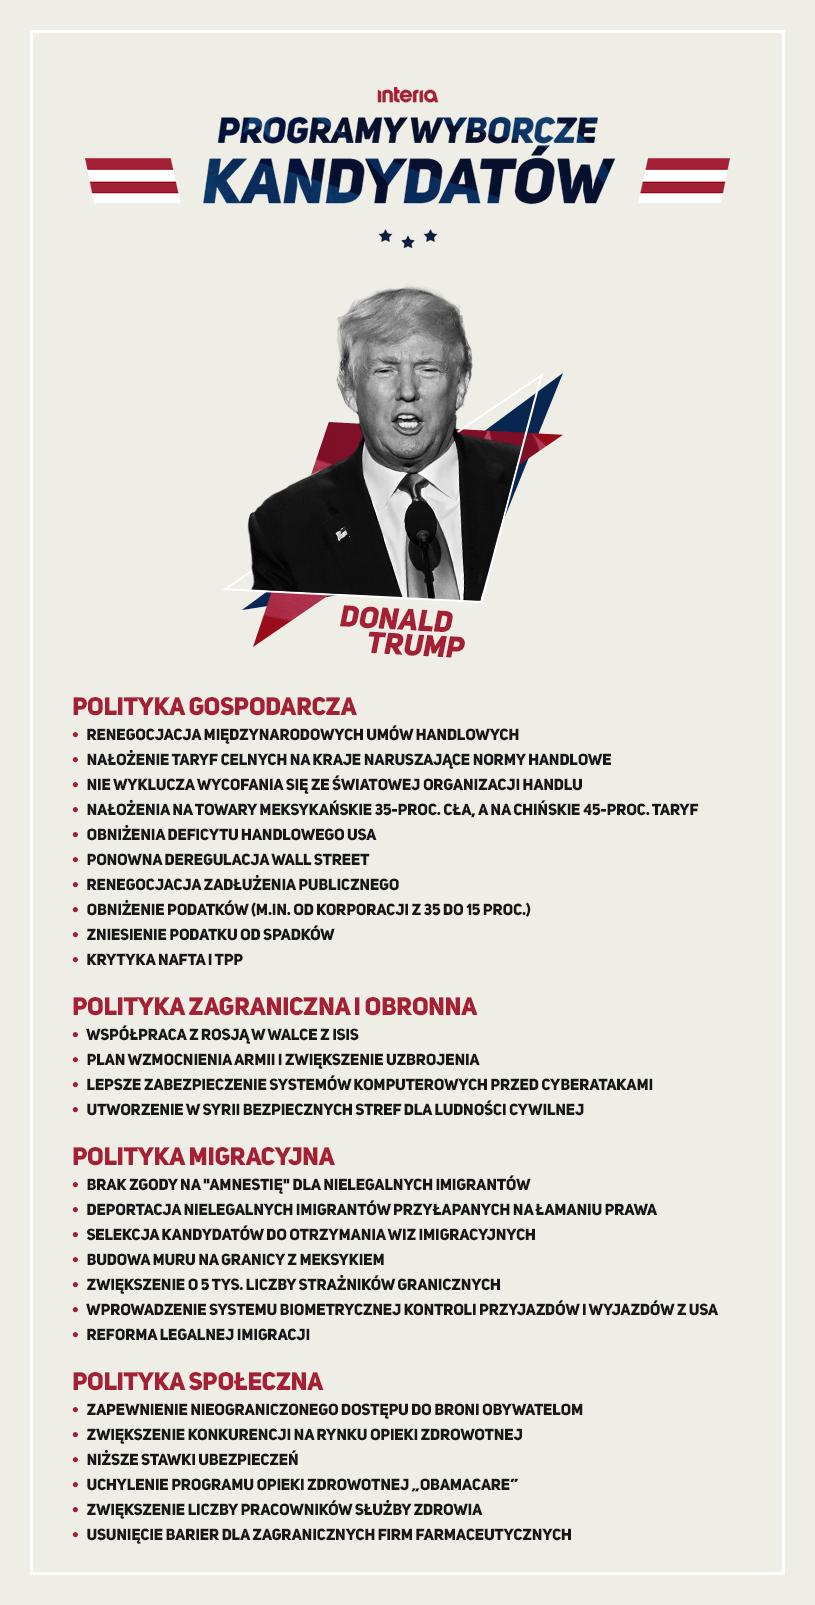 Lista obietnic Donalda Trumpa /INTERIA.PL